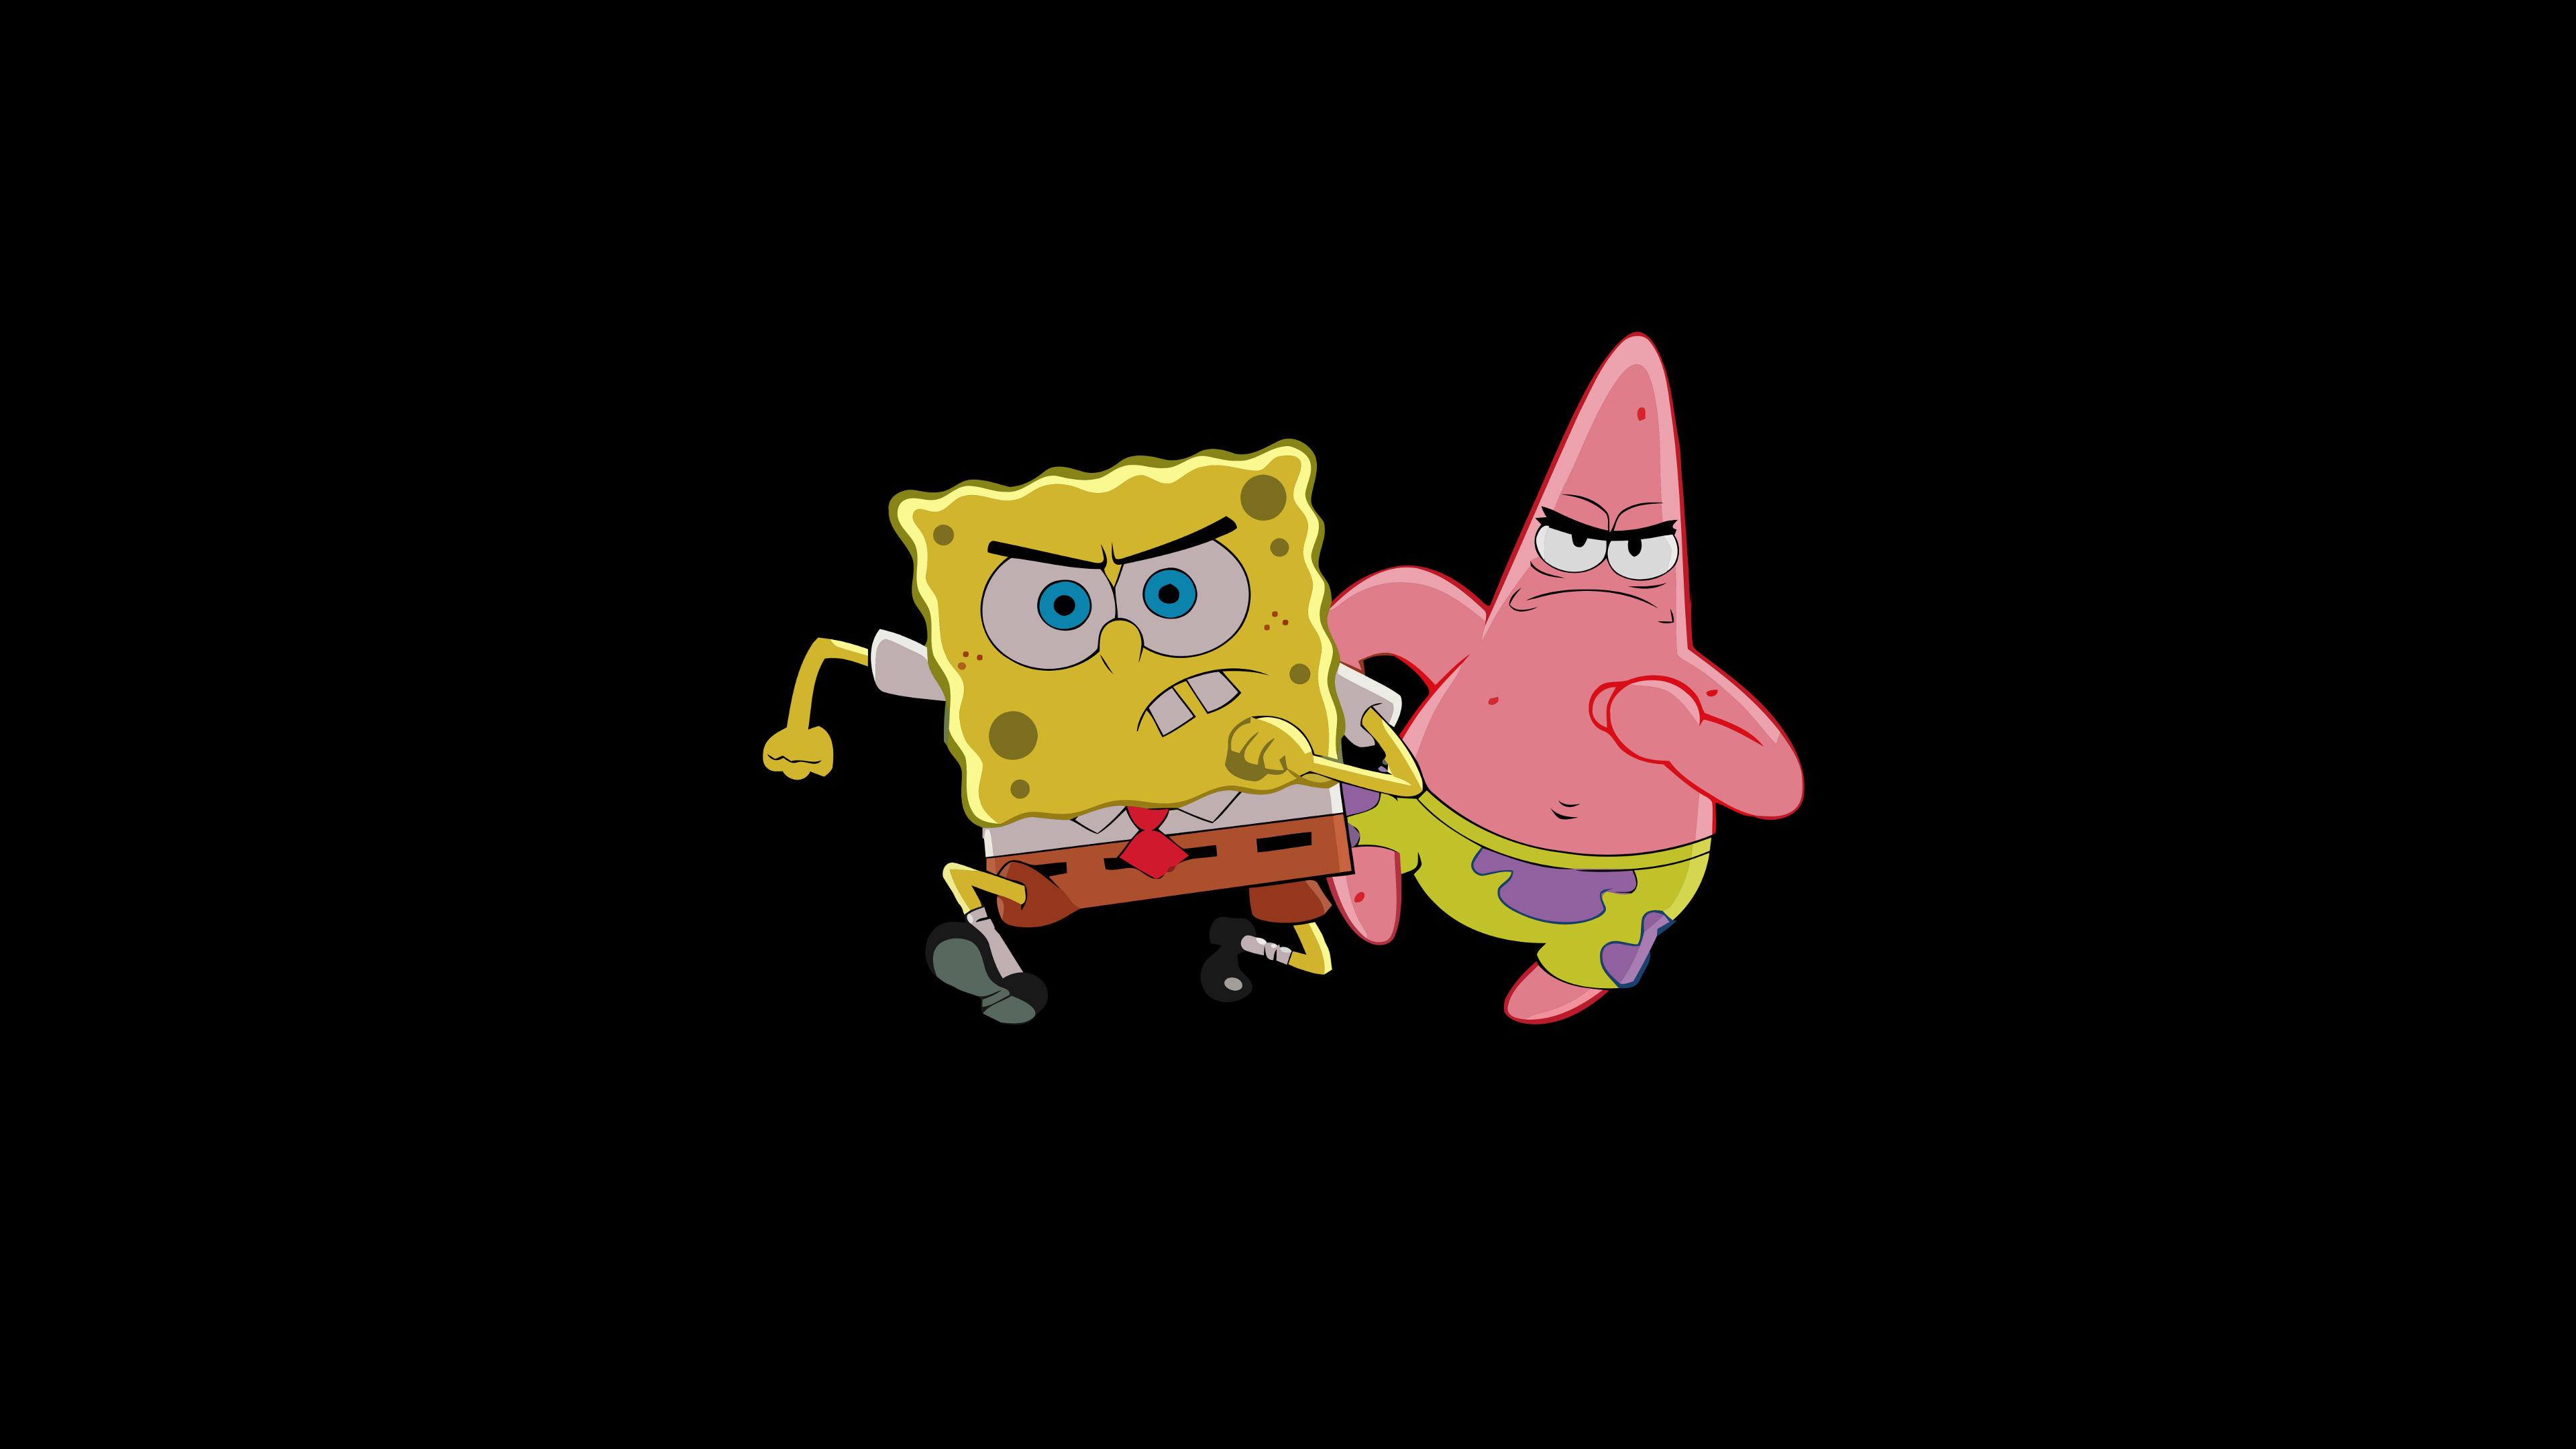 Patrick Star And Spongebob, HD Cartoons, 4k Wallpapers ...